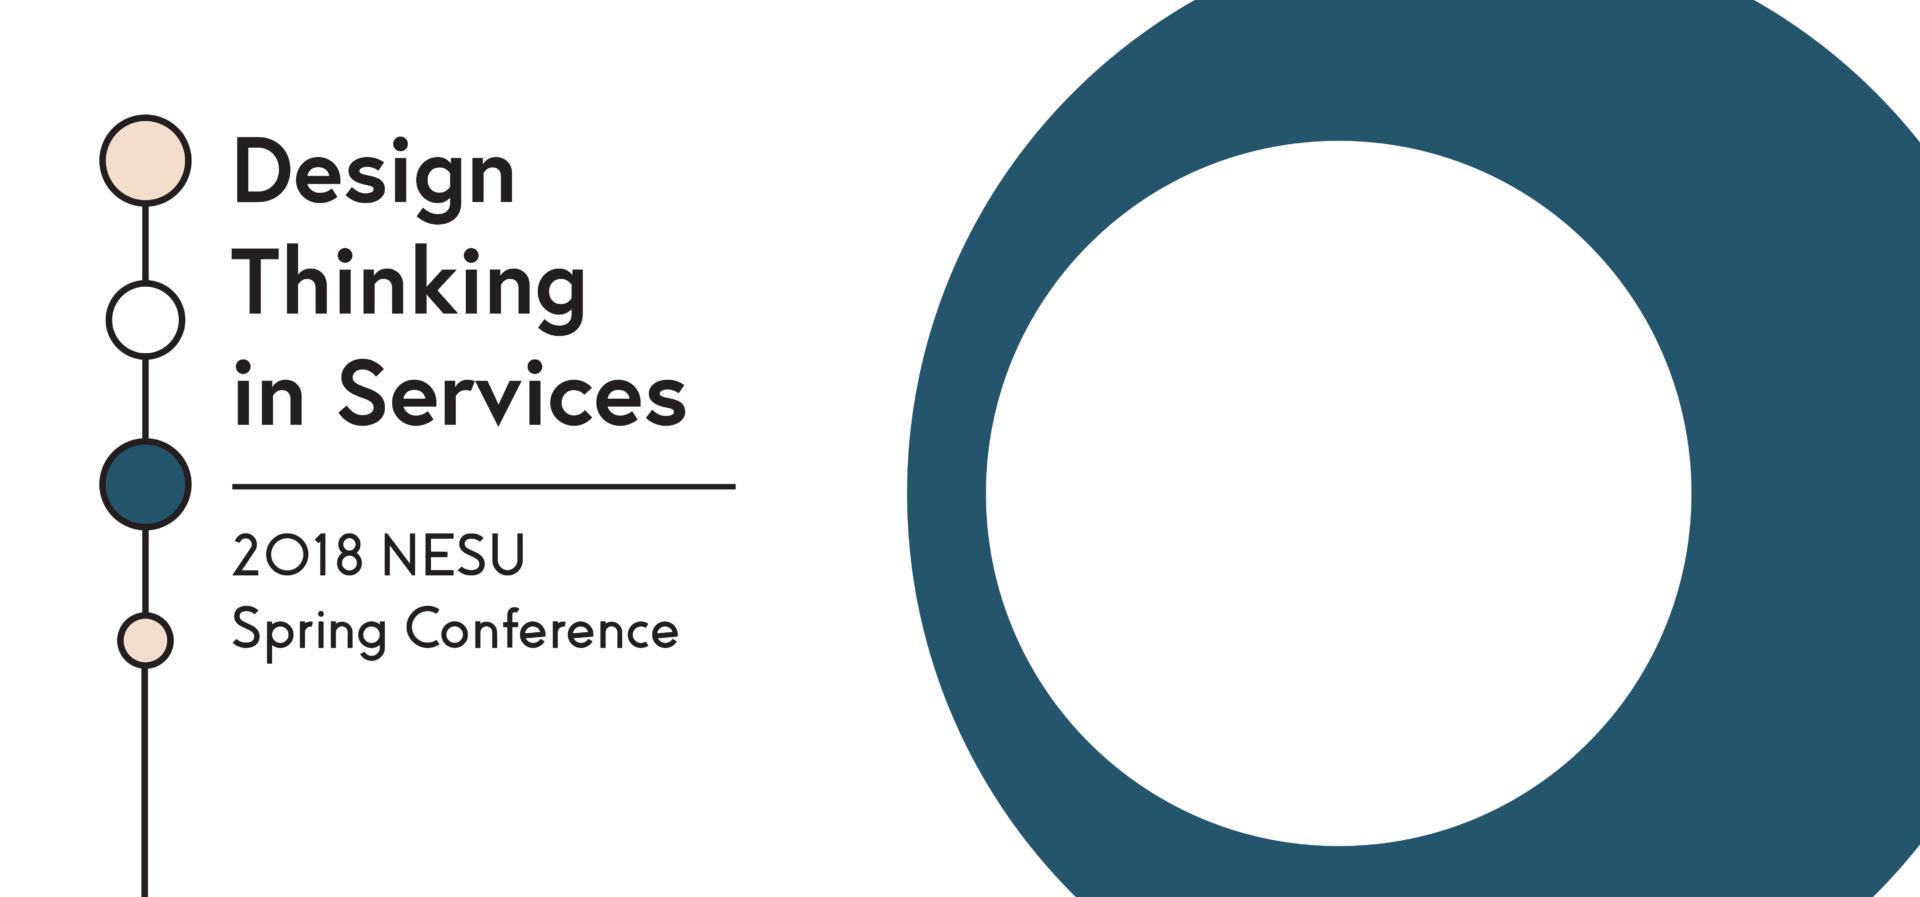 NESU Spring Conference 2018